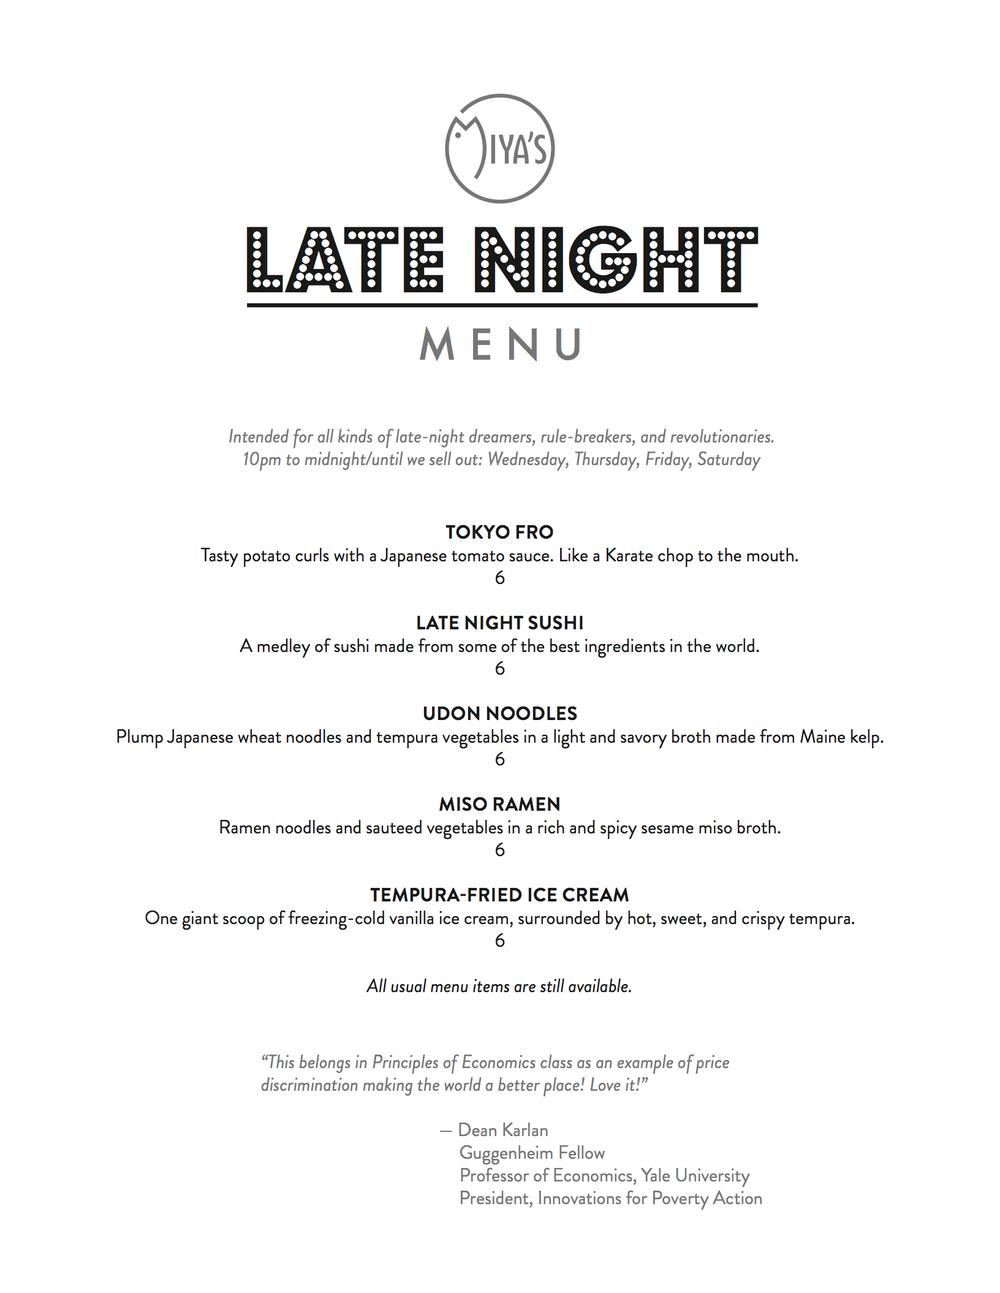 Served Thursday-Saturday, 10PM - Midnight